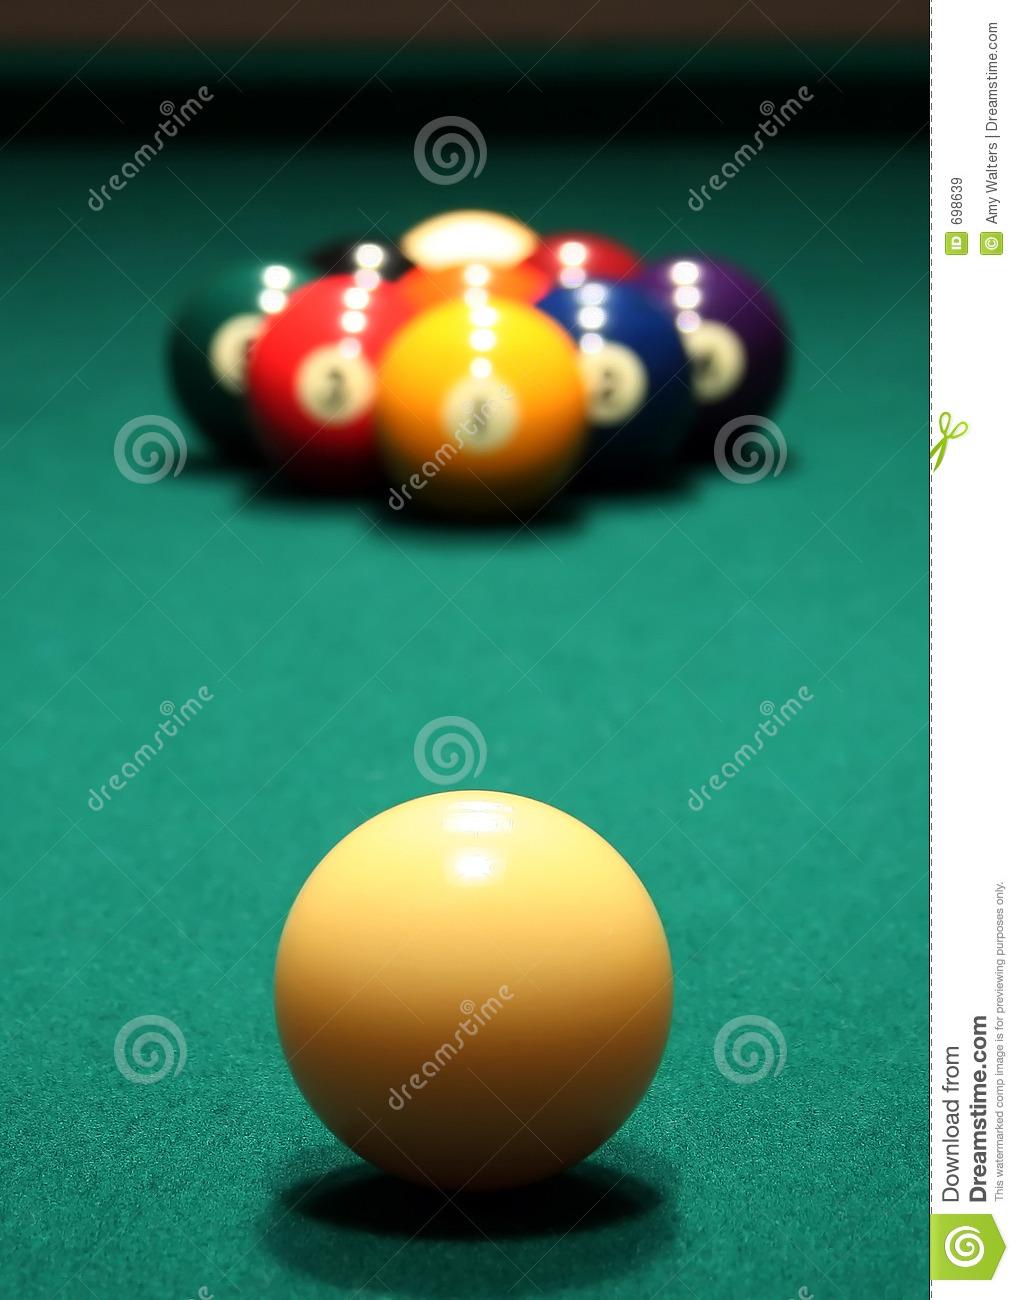 kootationcomBall And Pocket Royalty Stock Image 10740066 1019x1300